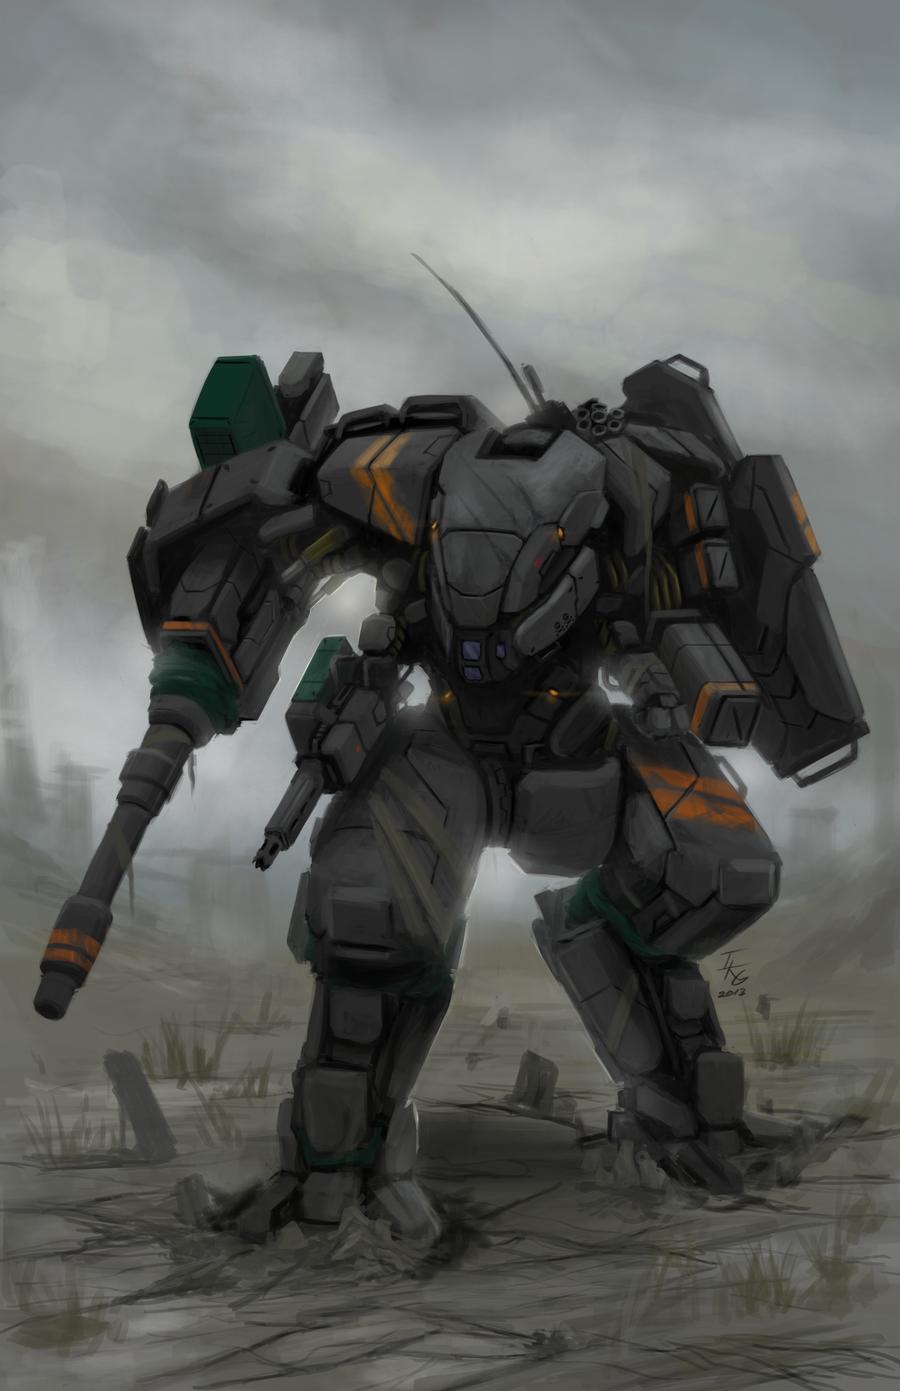 CGMA Mecha Contest Entry(Combat Mech) by ~ianskie1 on